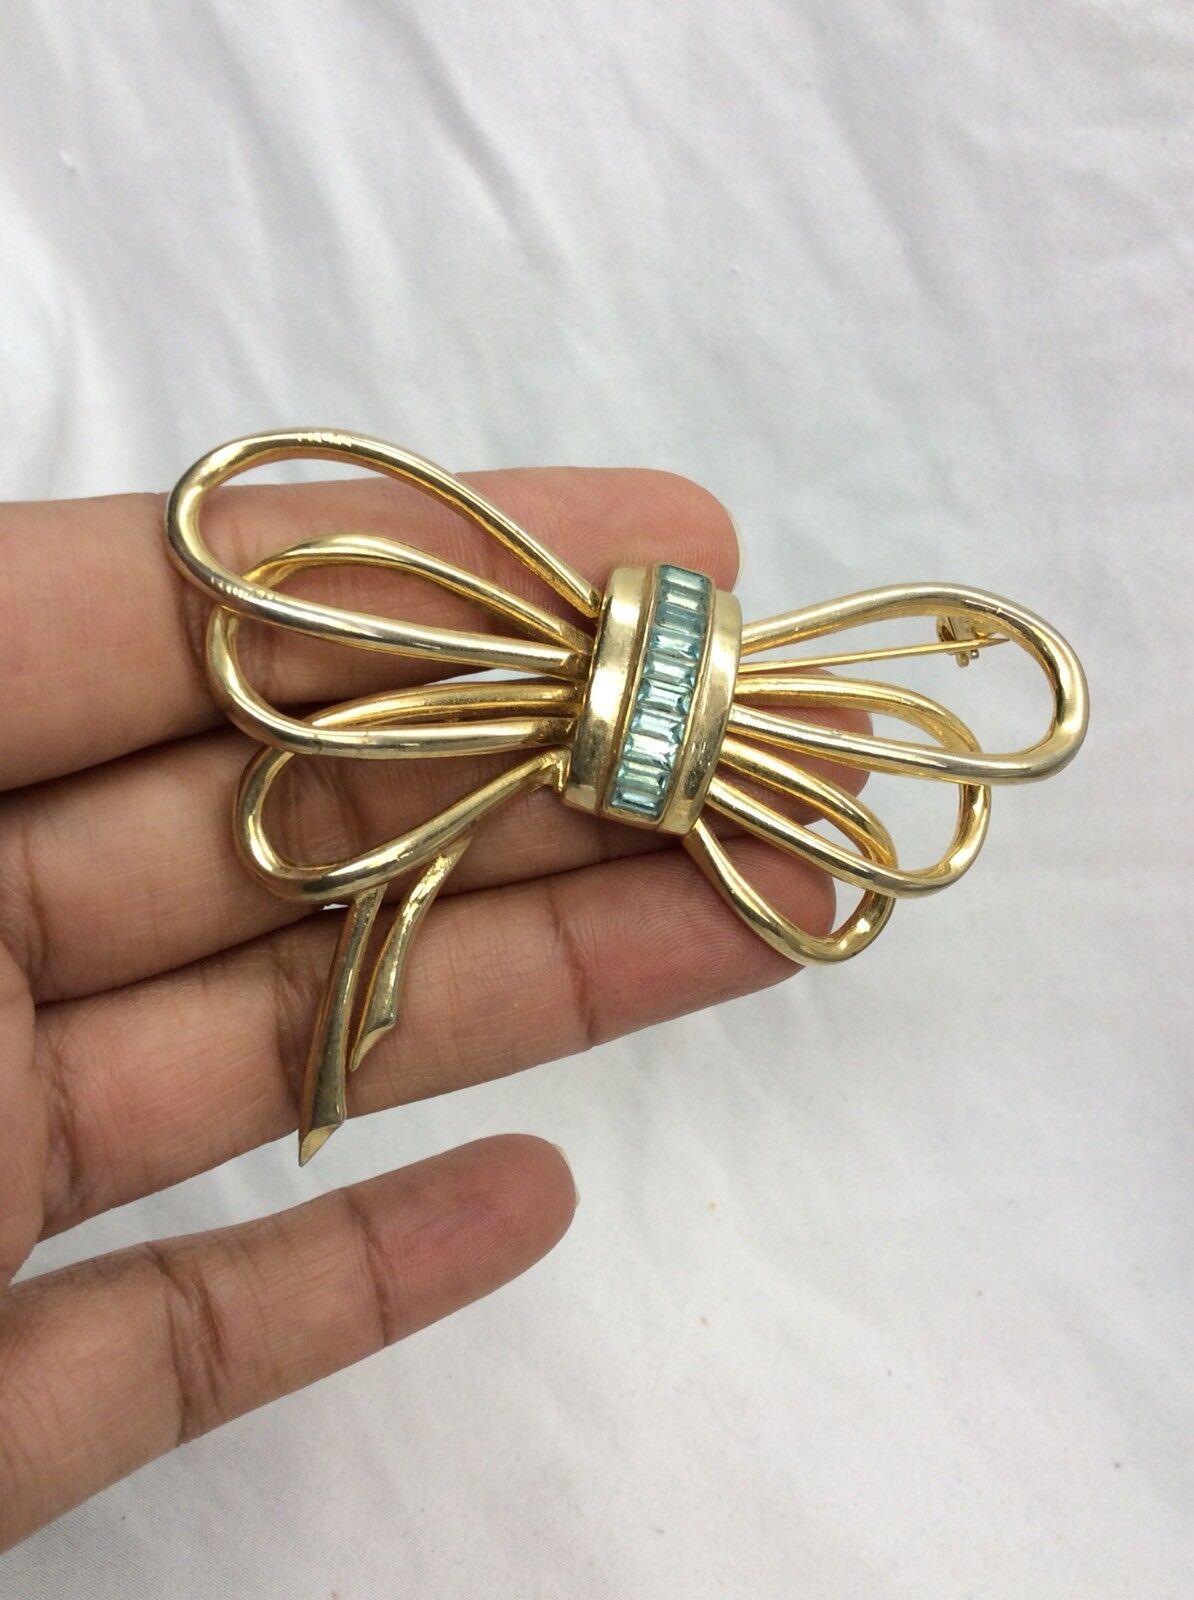 Beautiful Vtg Les Bernard Retro bluee Rhinestone Bow gold tone Pin brooch